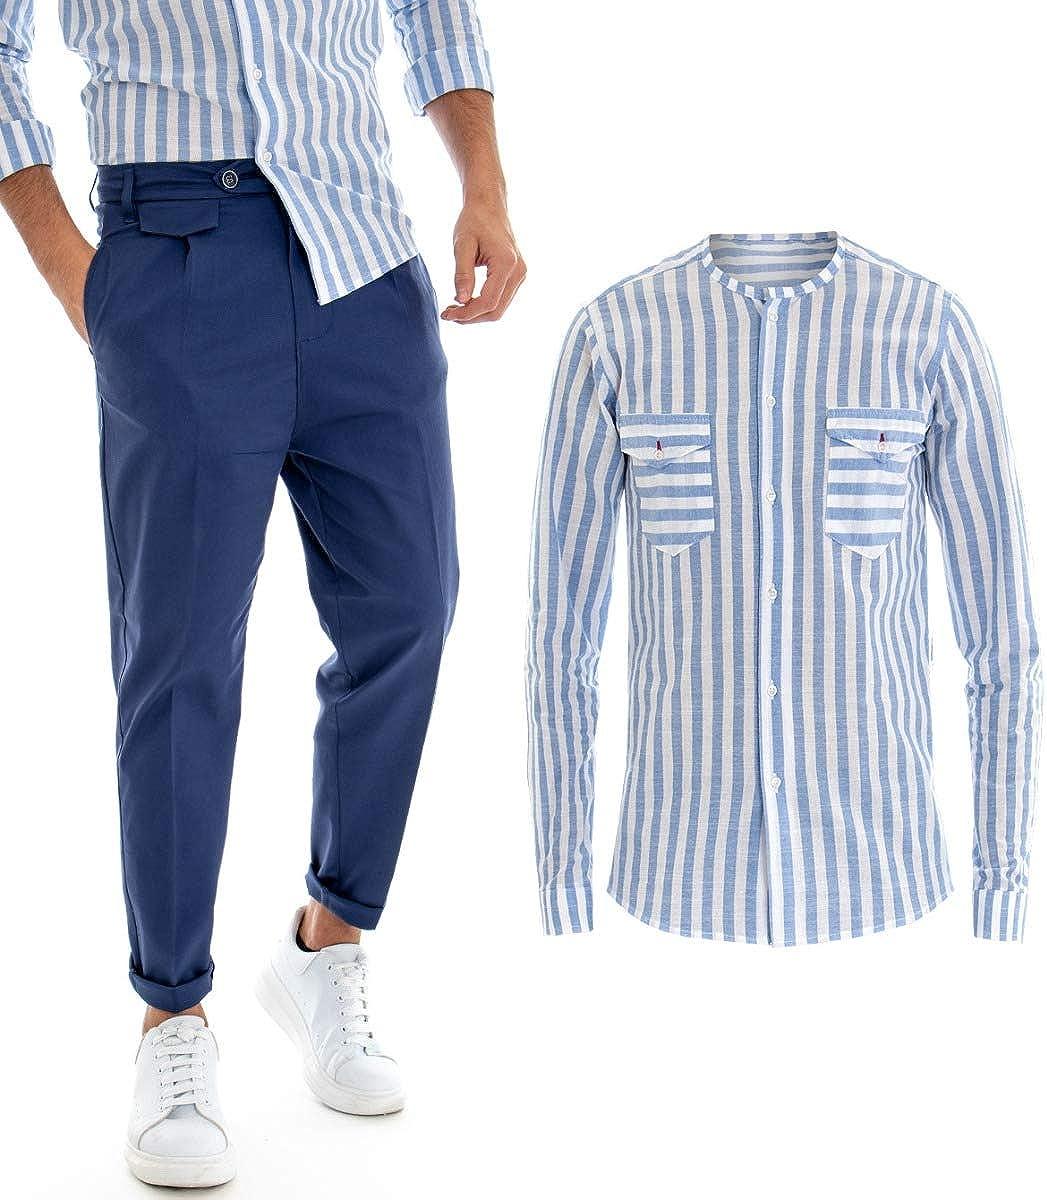 Giosal Outfit Camisa a Rayas Azul Cuello Coreano Completo ...